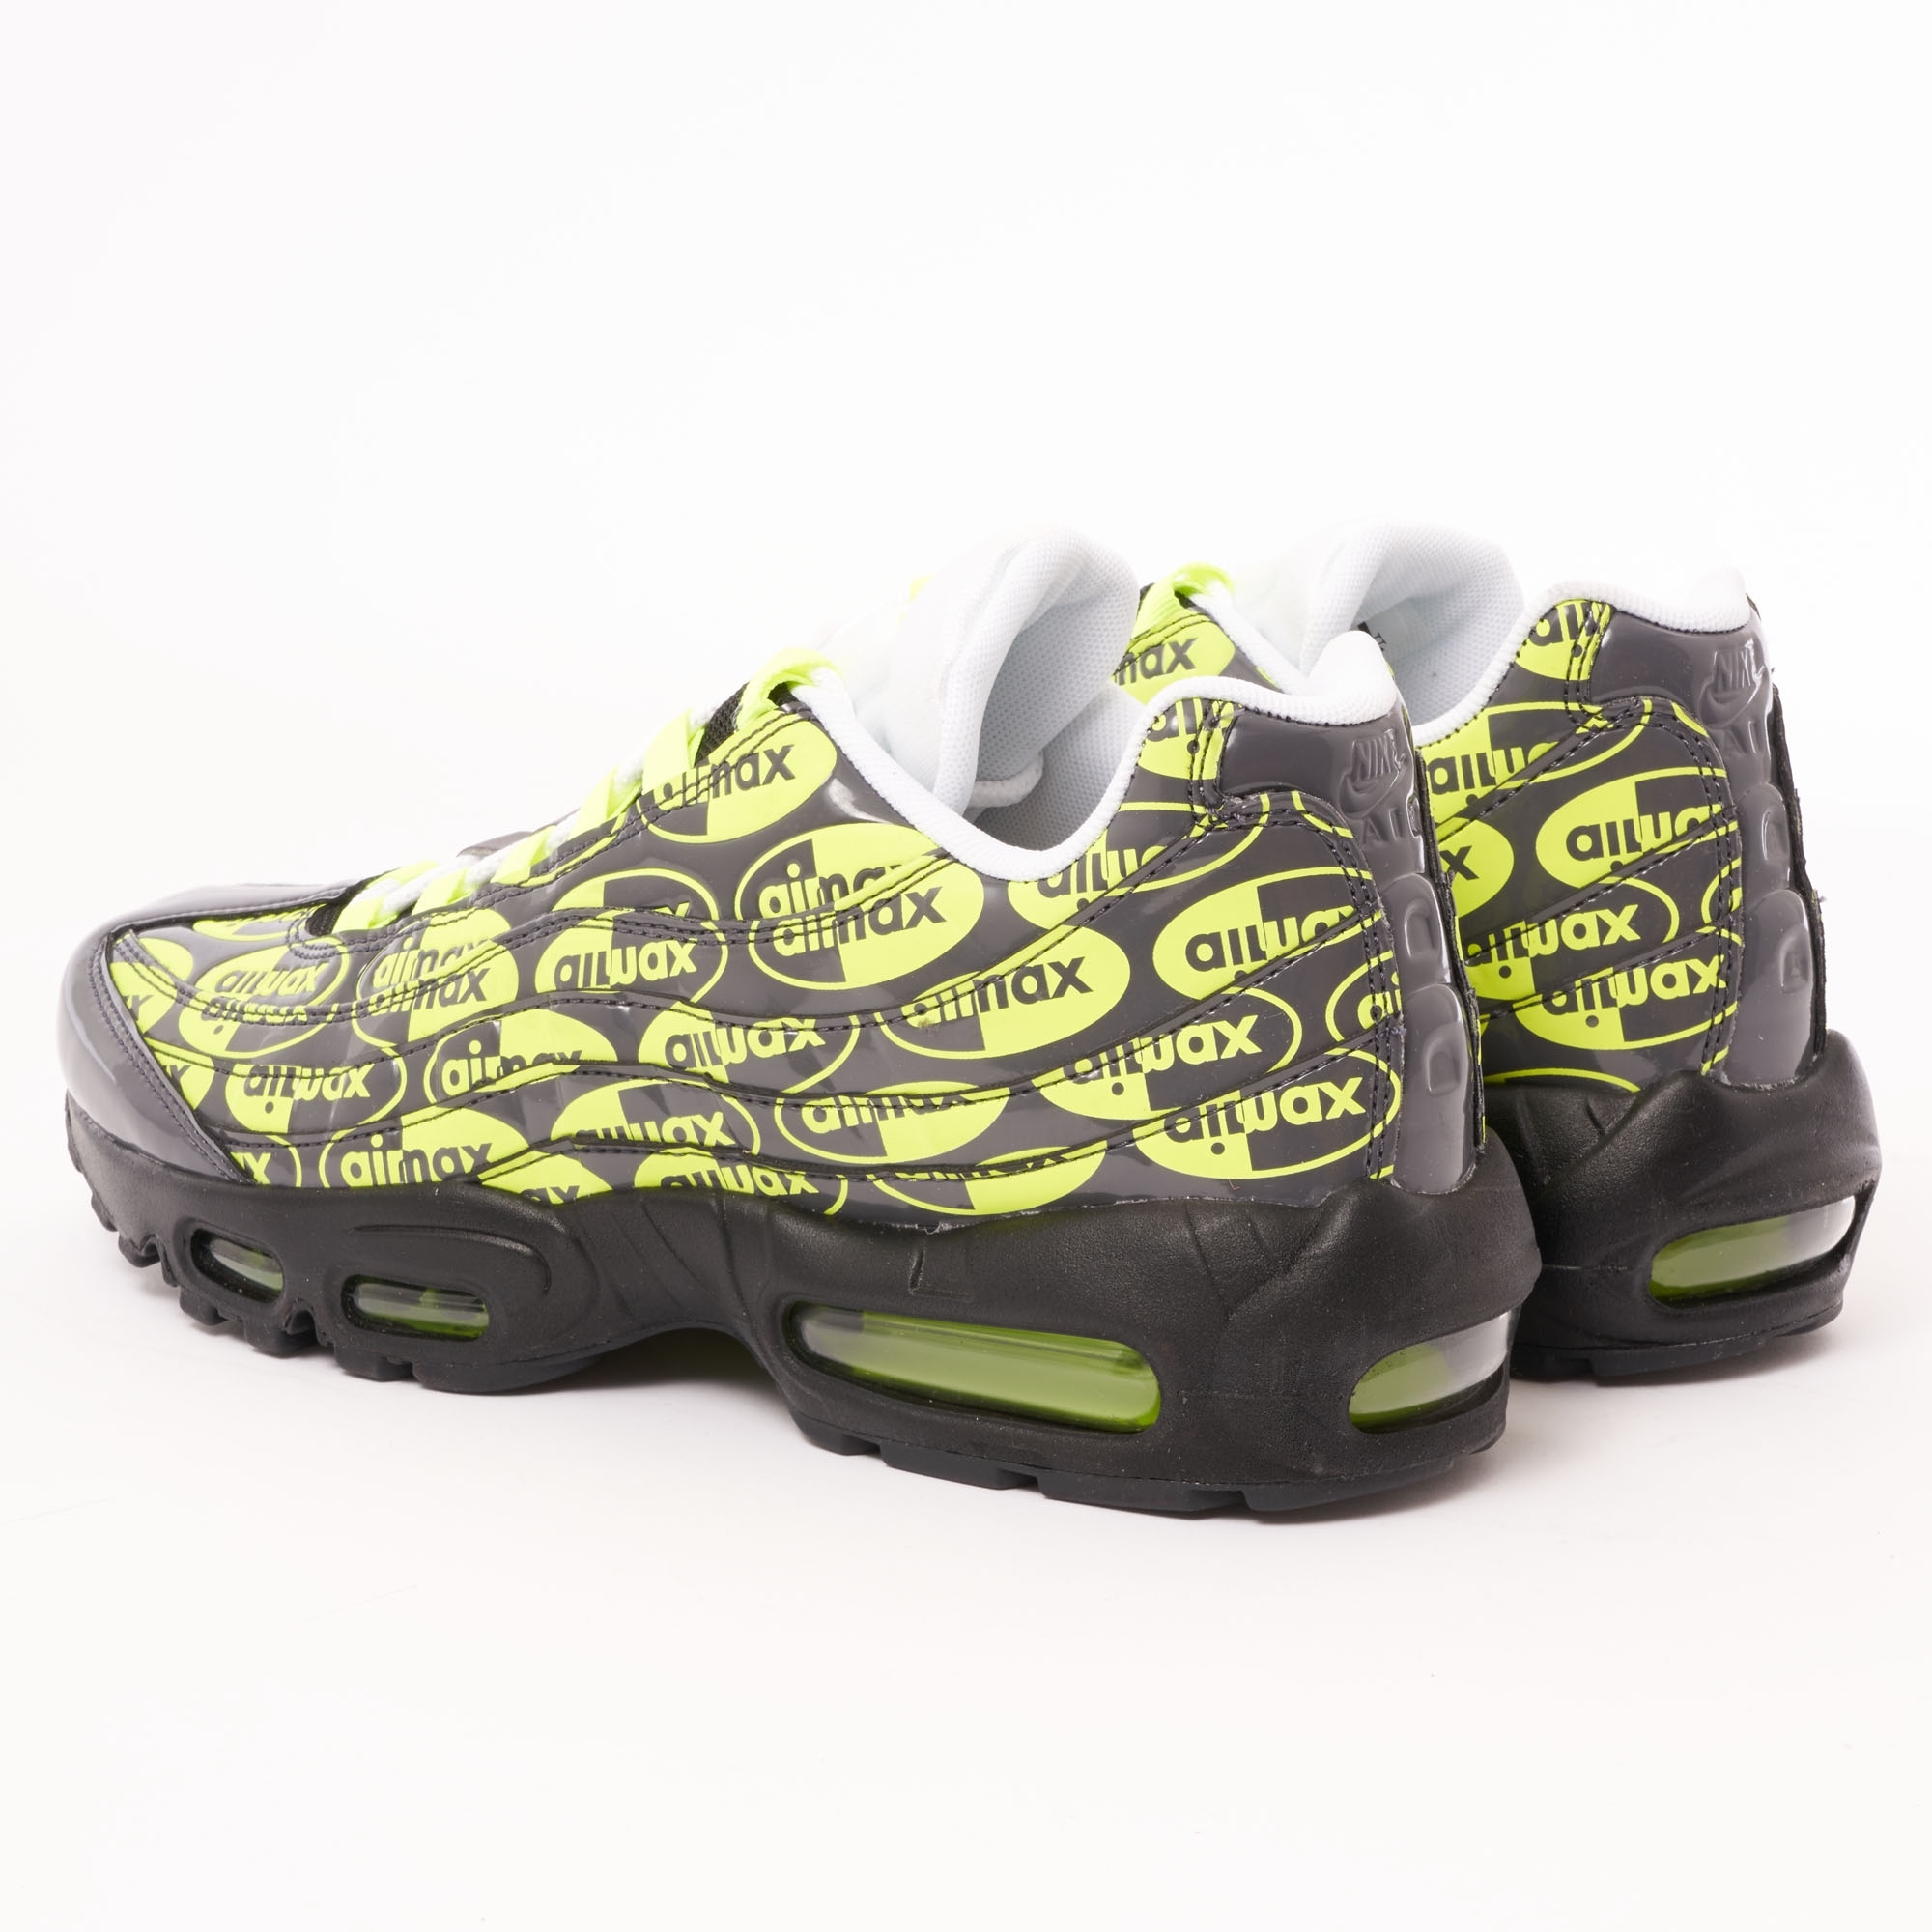 Nike Air Max 95 'BlackVoltAshWhite' 538416 019 Release